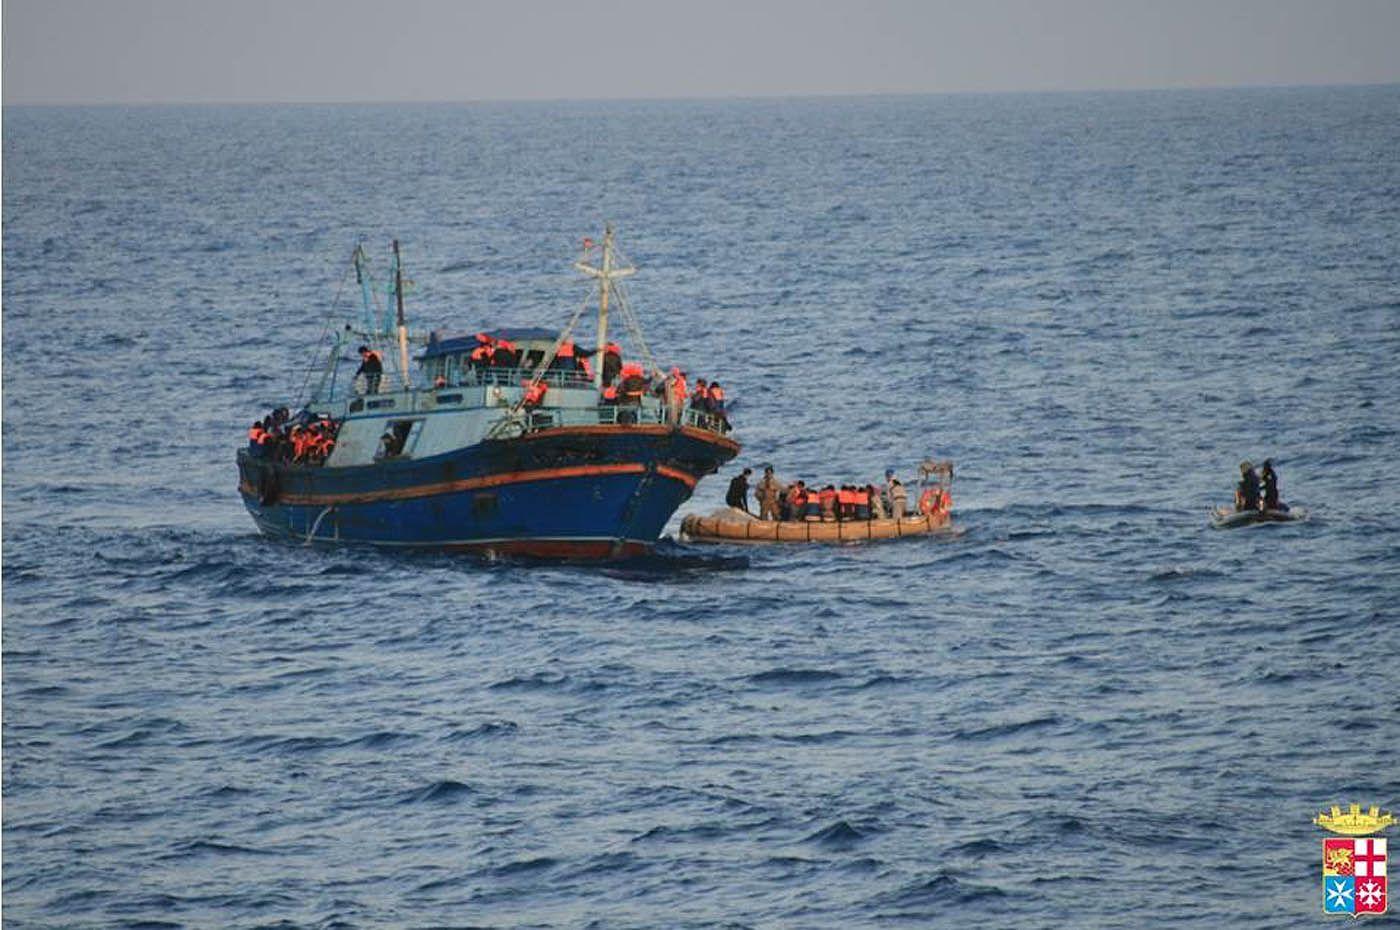 EINMALIGE VERWENDUNG Italien/ Lampedusa/ Flüchtlinge